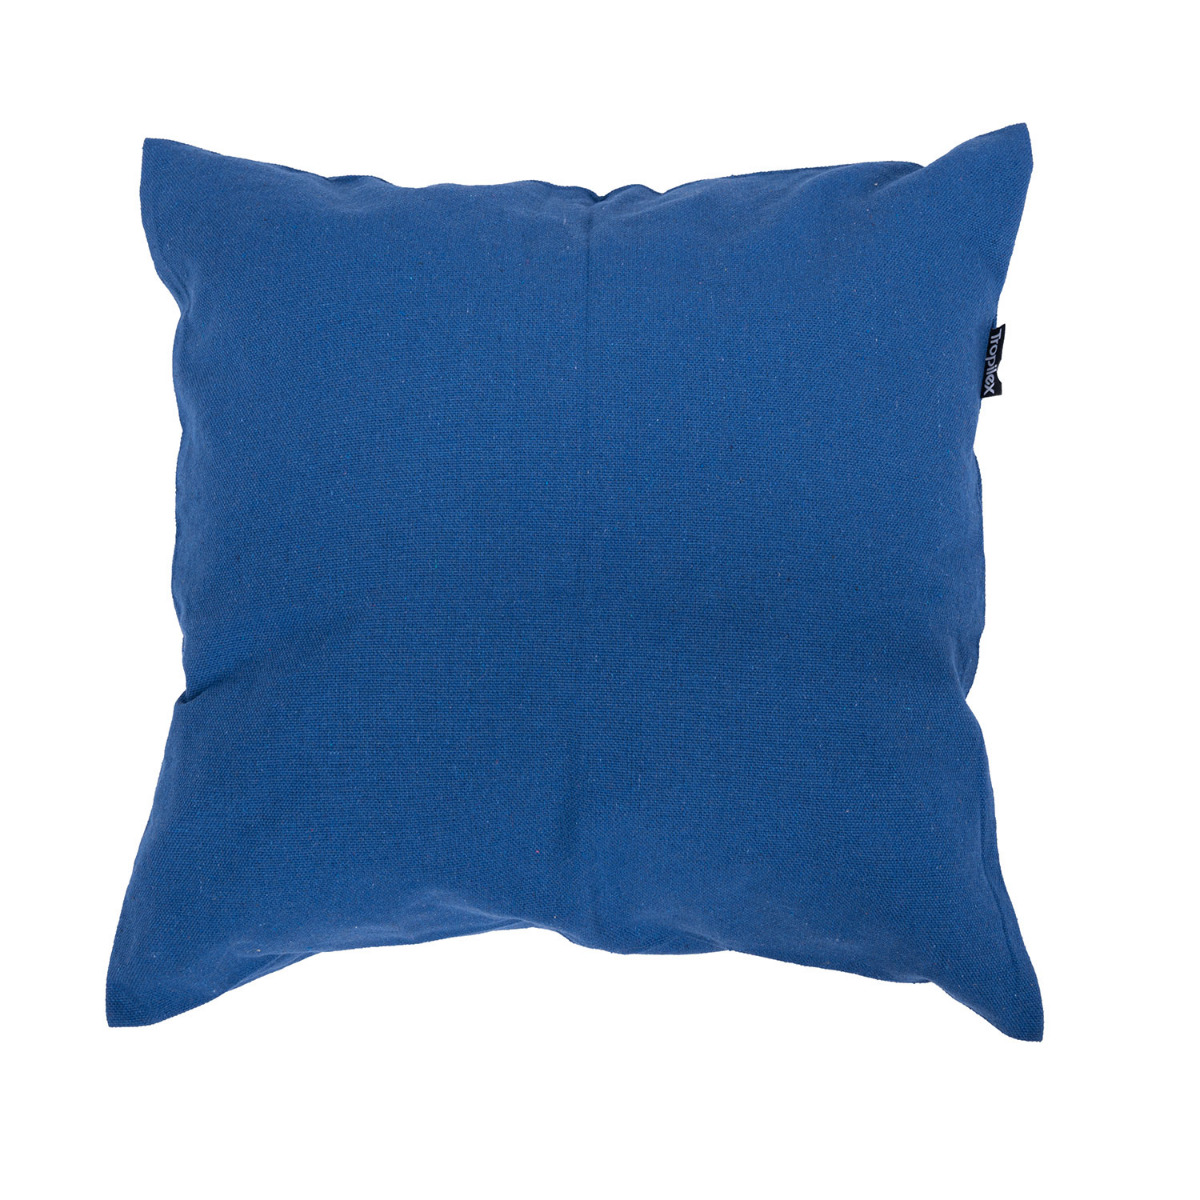 Kussen 'Plain' Blue - Tropilex �